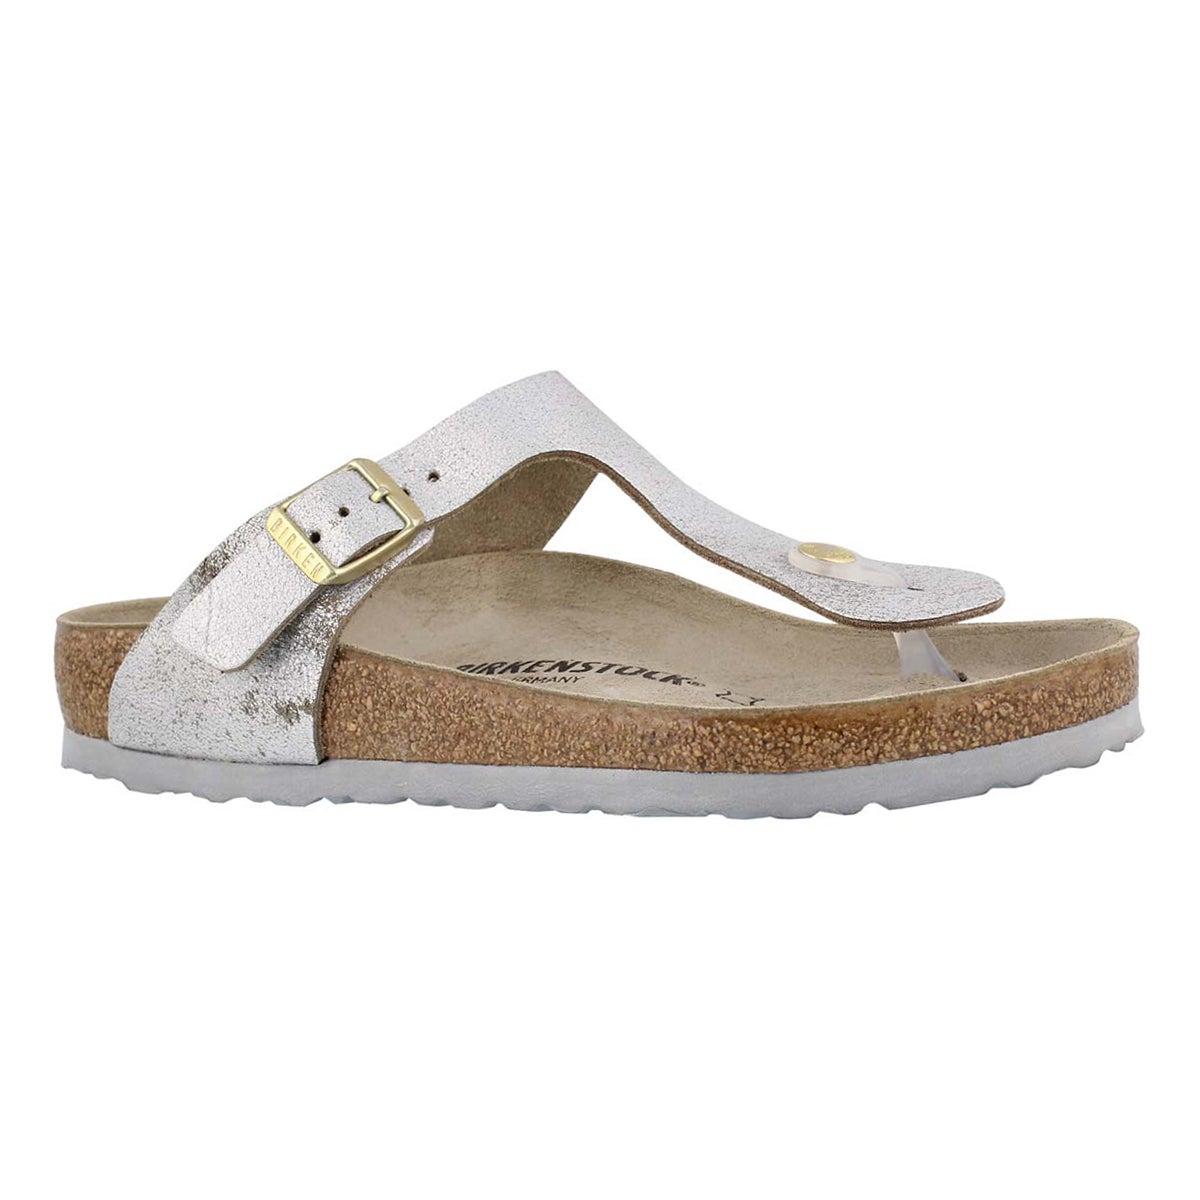 Women's GIZEH leather metallic blue/silver sandals